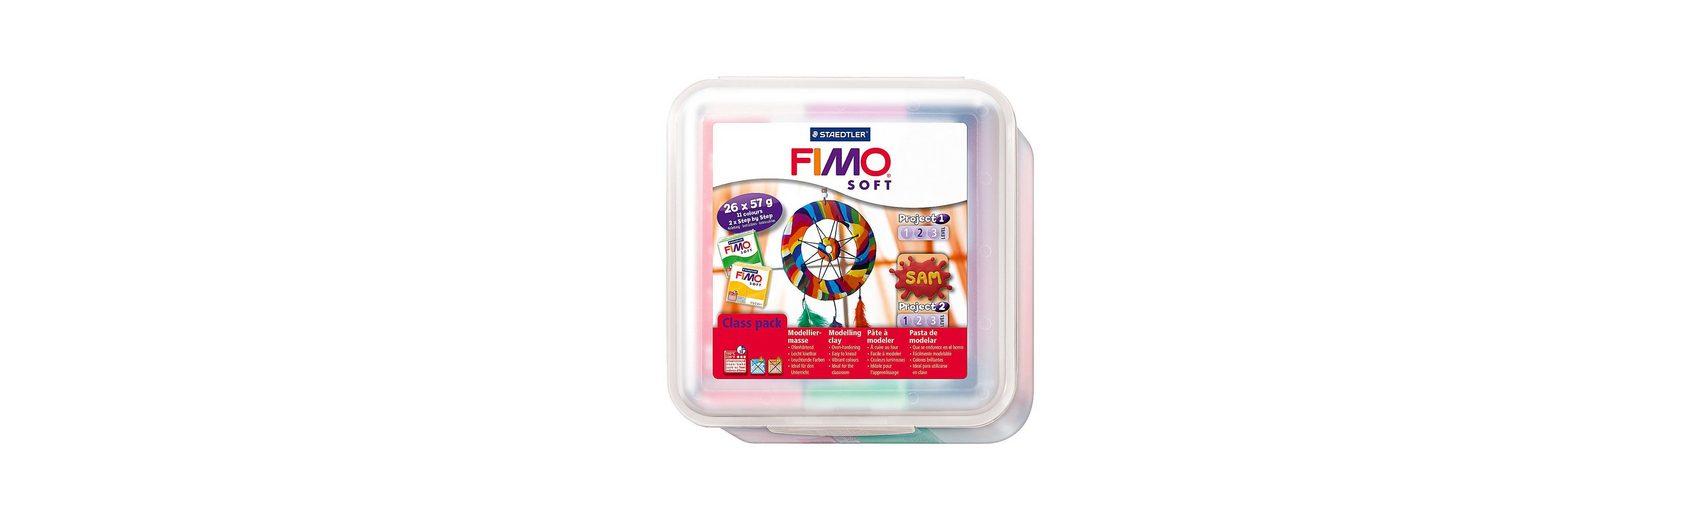 FIMO soft Big Box, 26 x 57 g